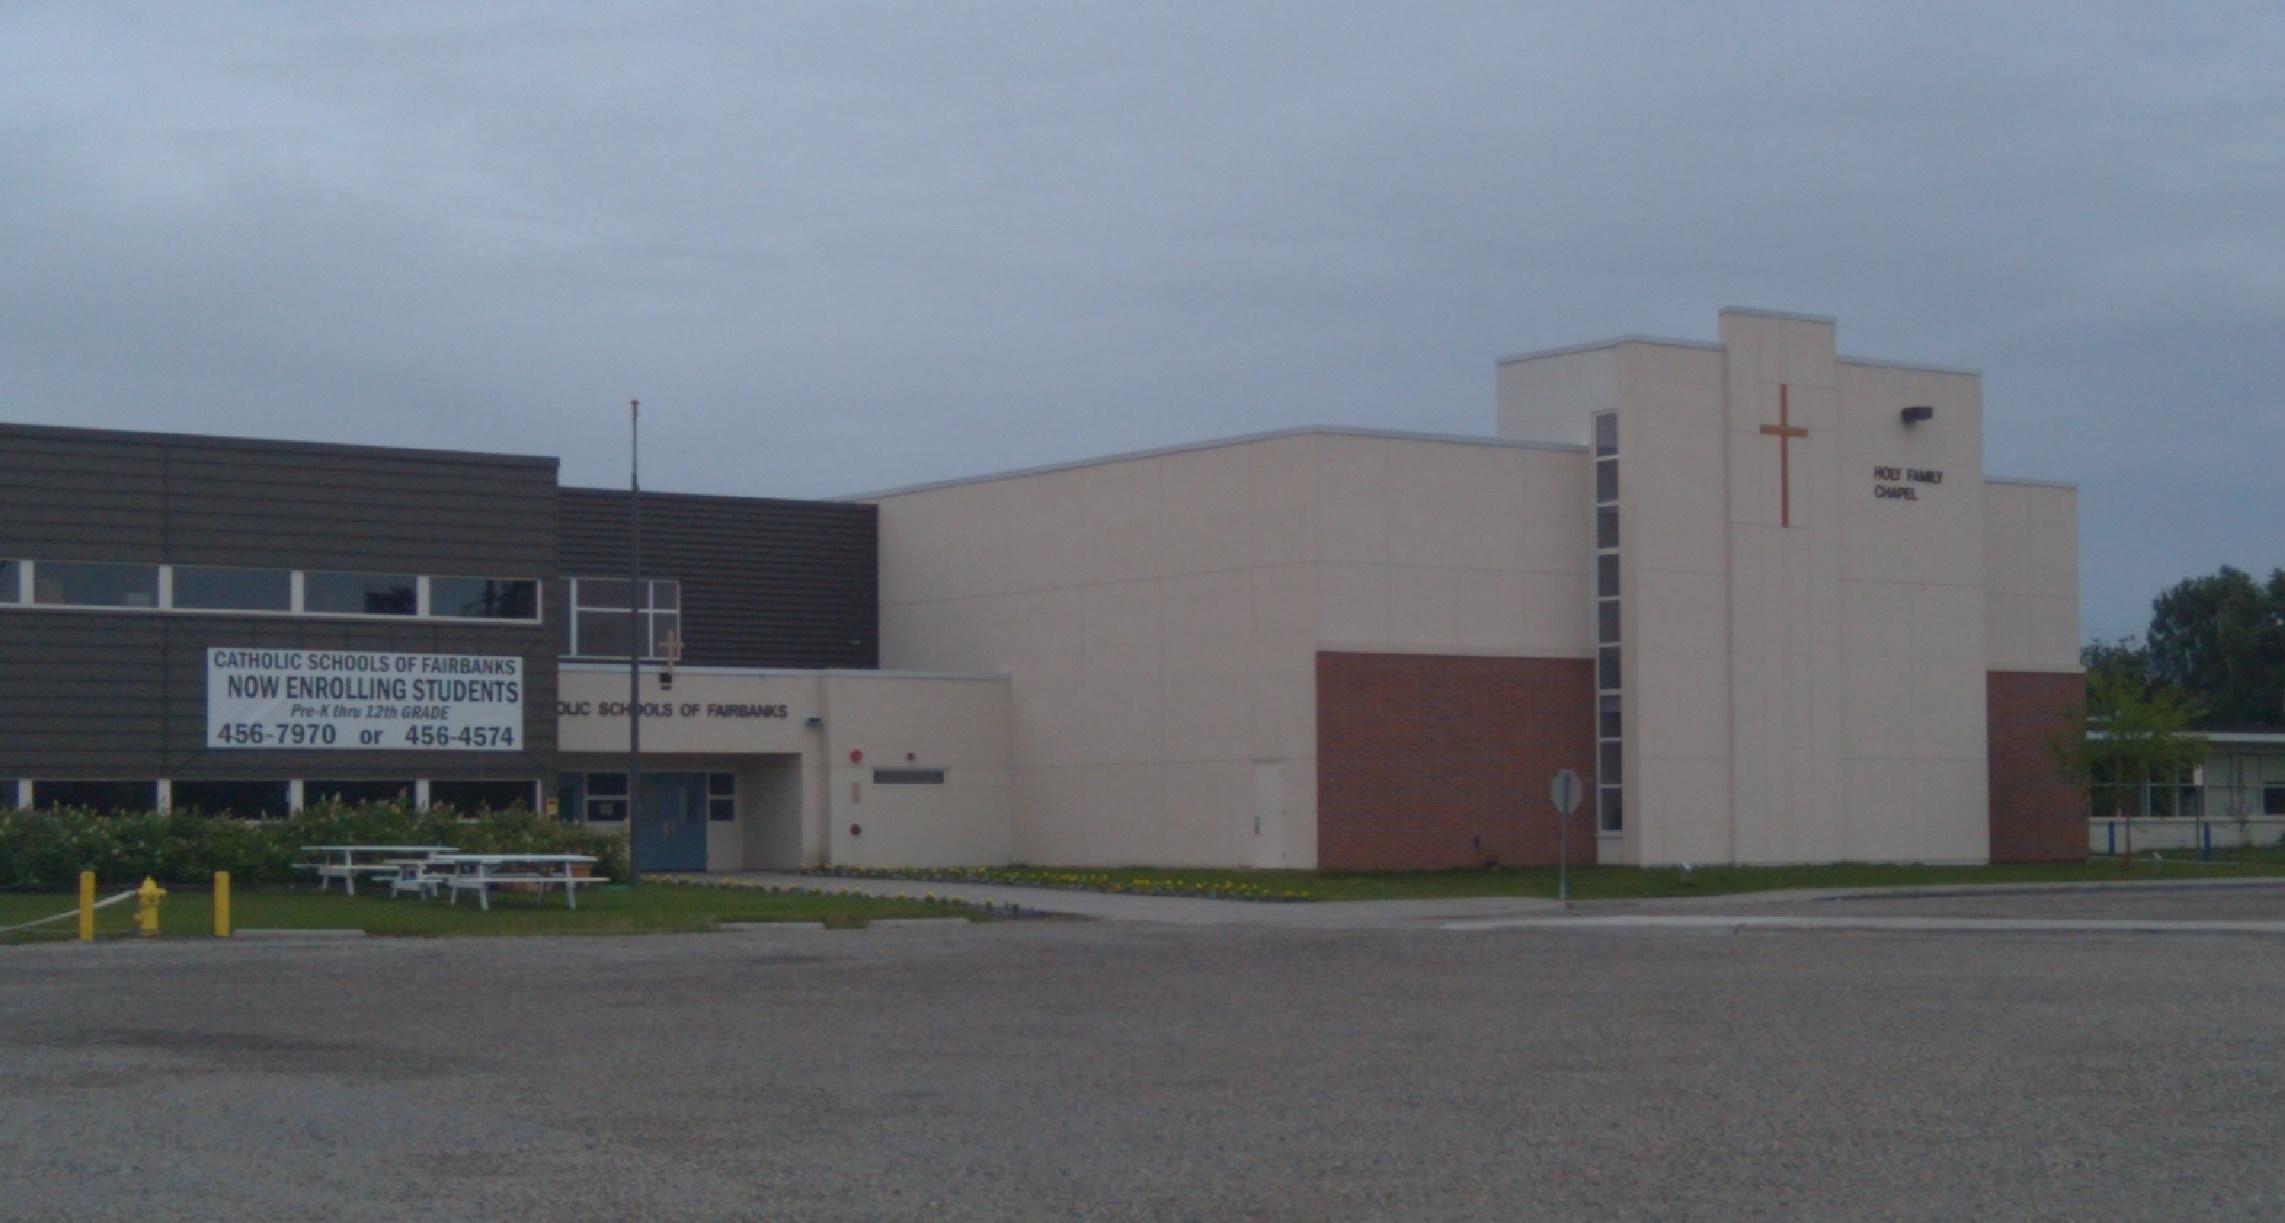 catholic singles in fort wainwright Fort wainwright religious support (907) inspirare, evigilane faciatis, et lumen garrison garrison ministry team: 353-6295 religious support resource management: 353-9825.